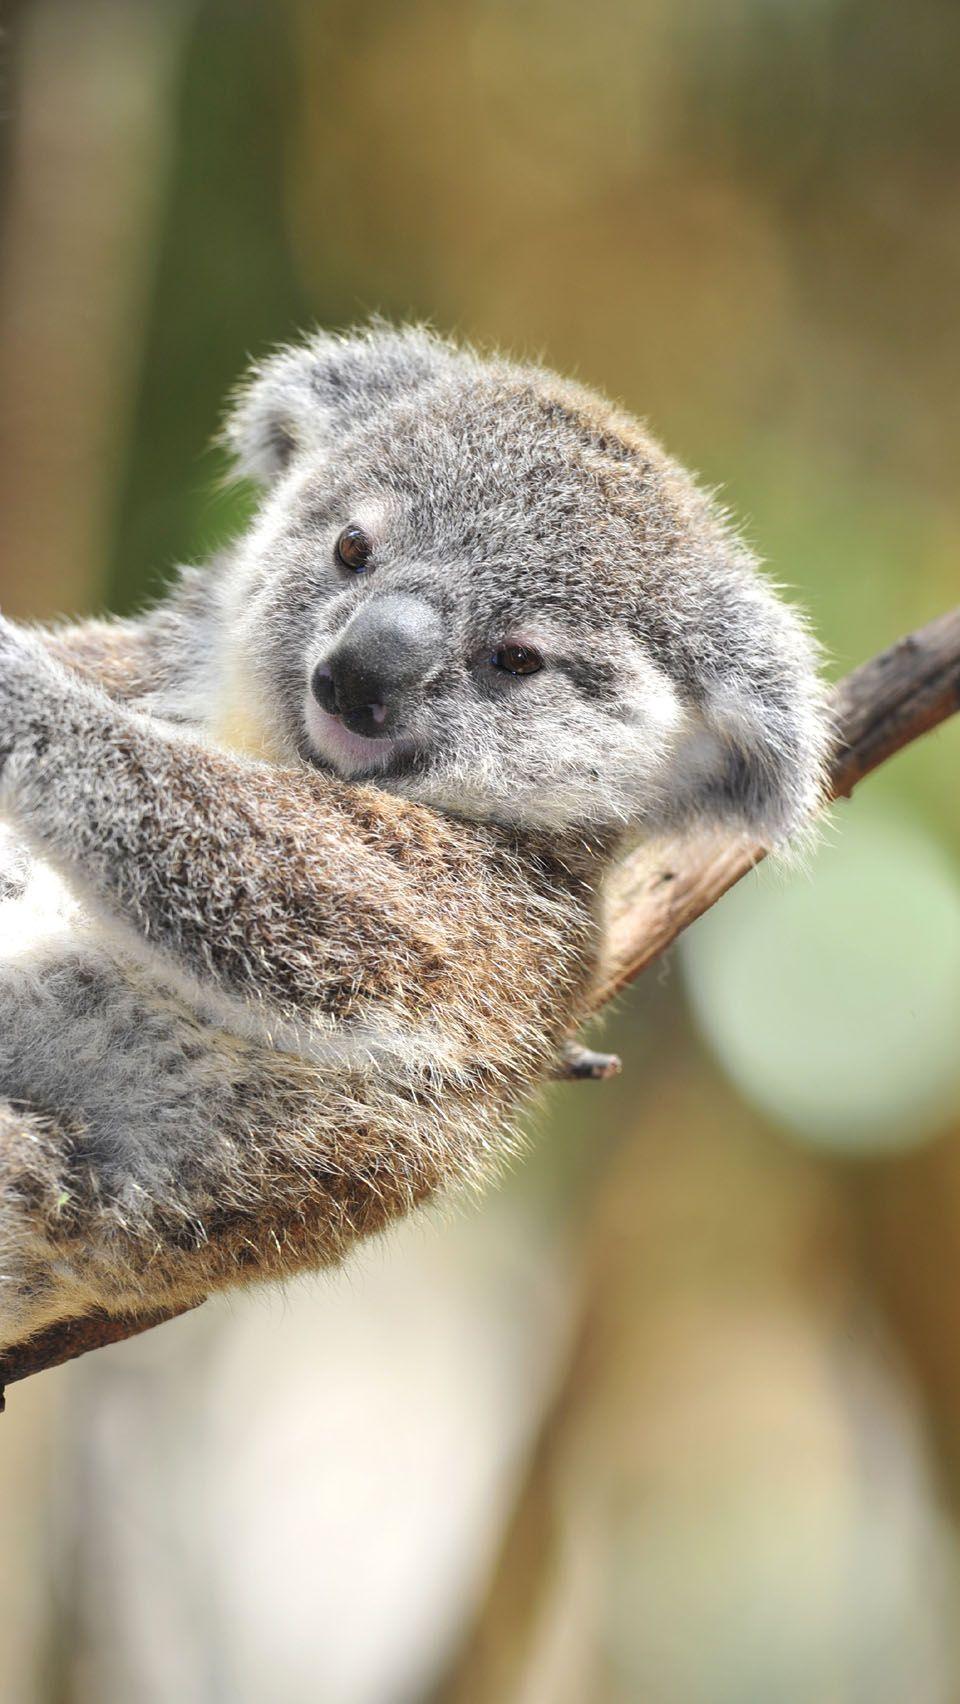 Cute Baby Koala OriginalSuper Cute Baby Koala iPhone